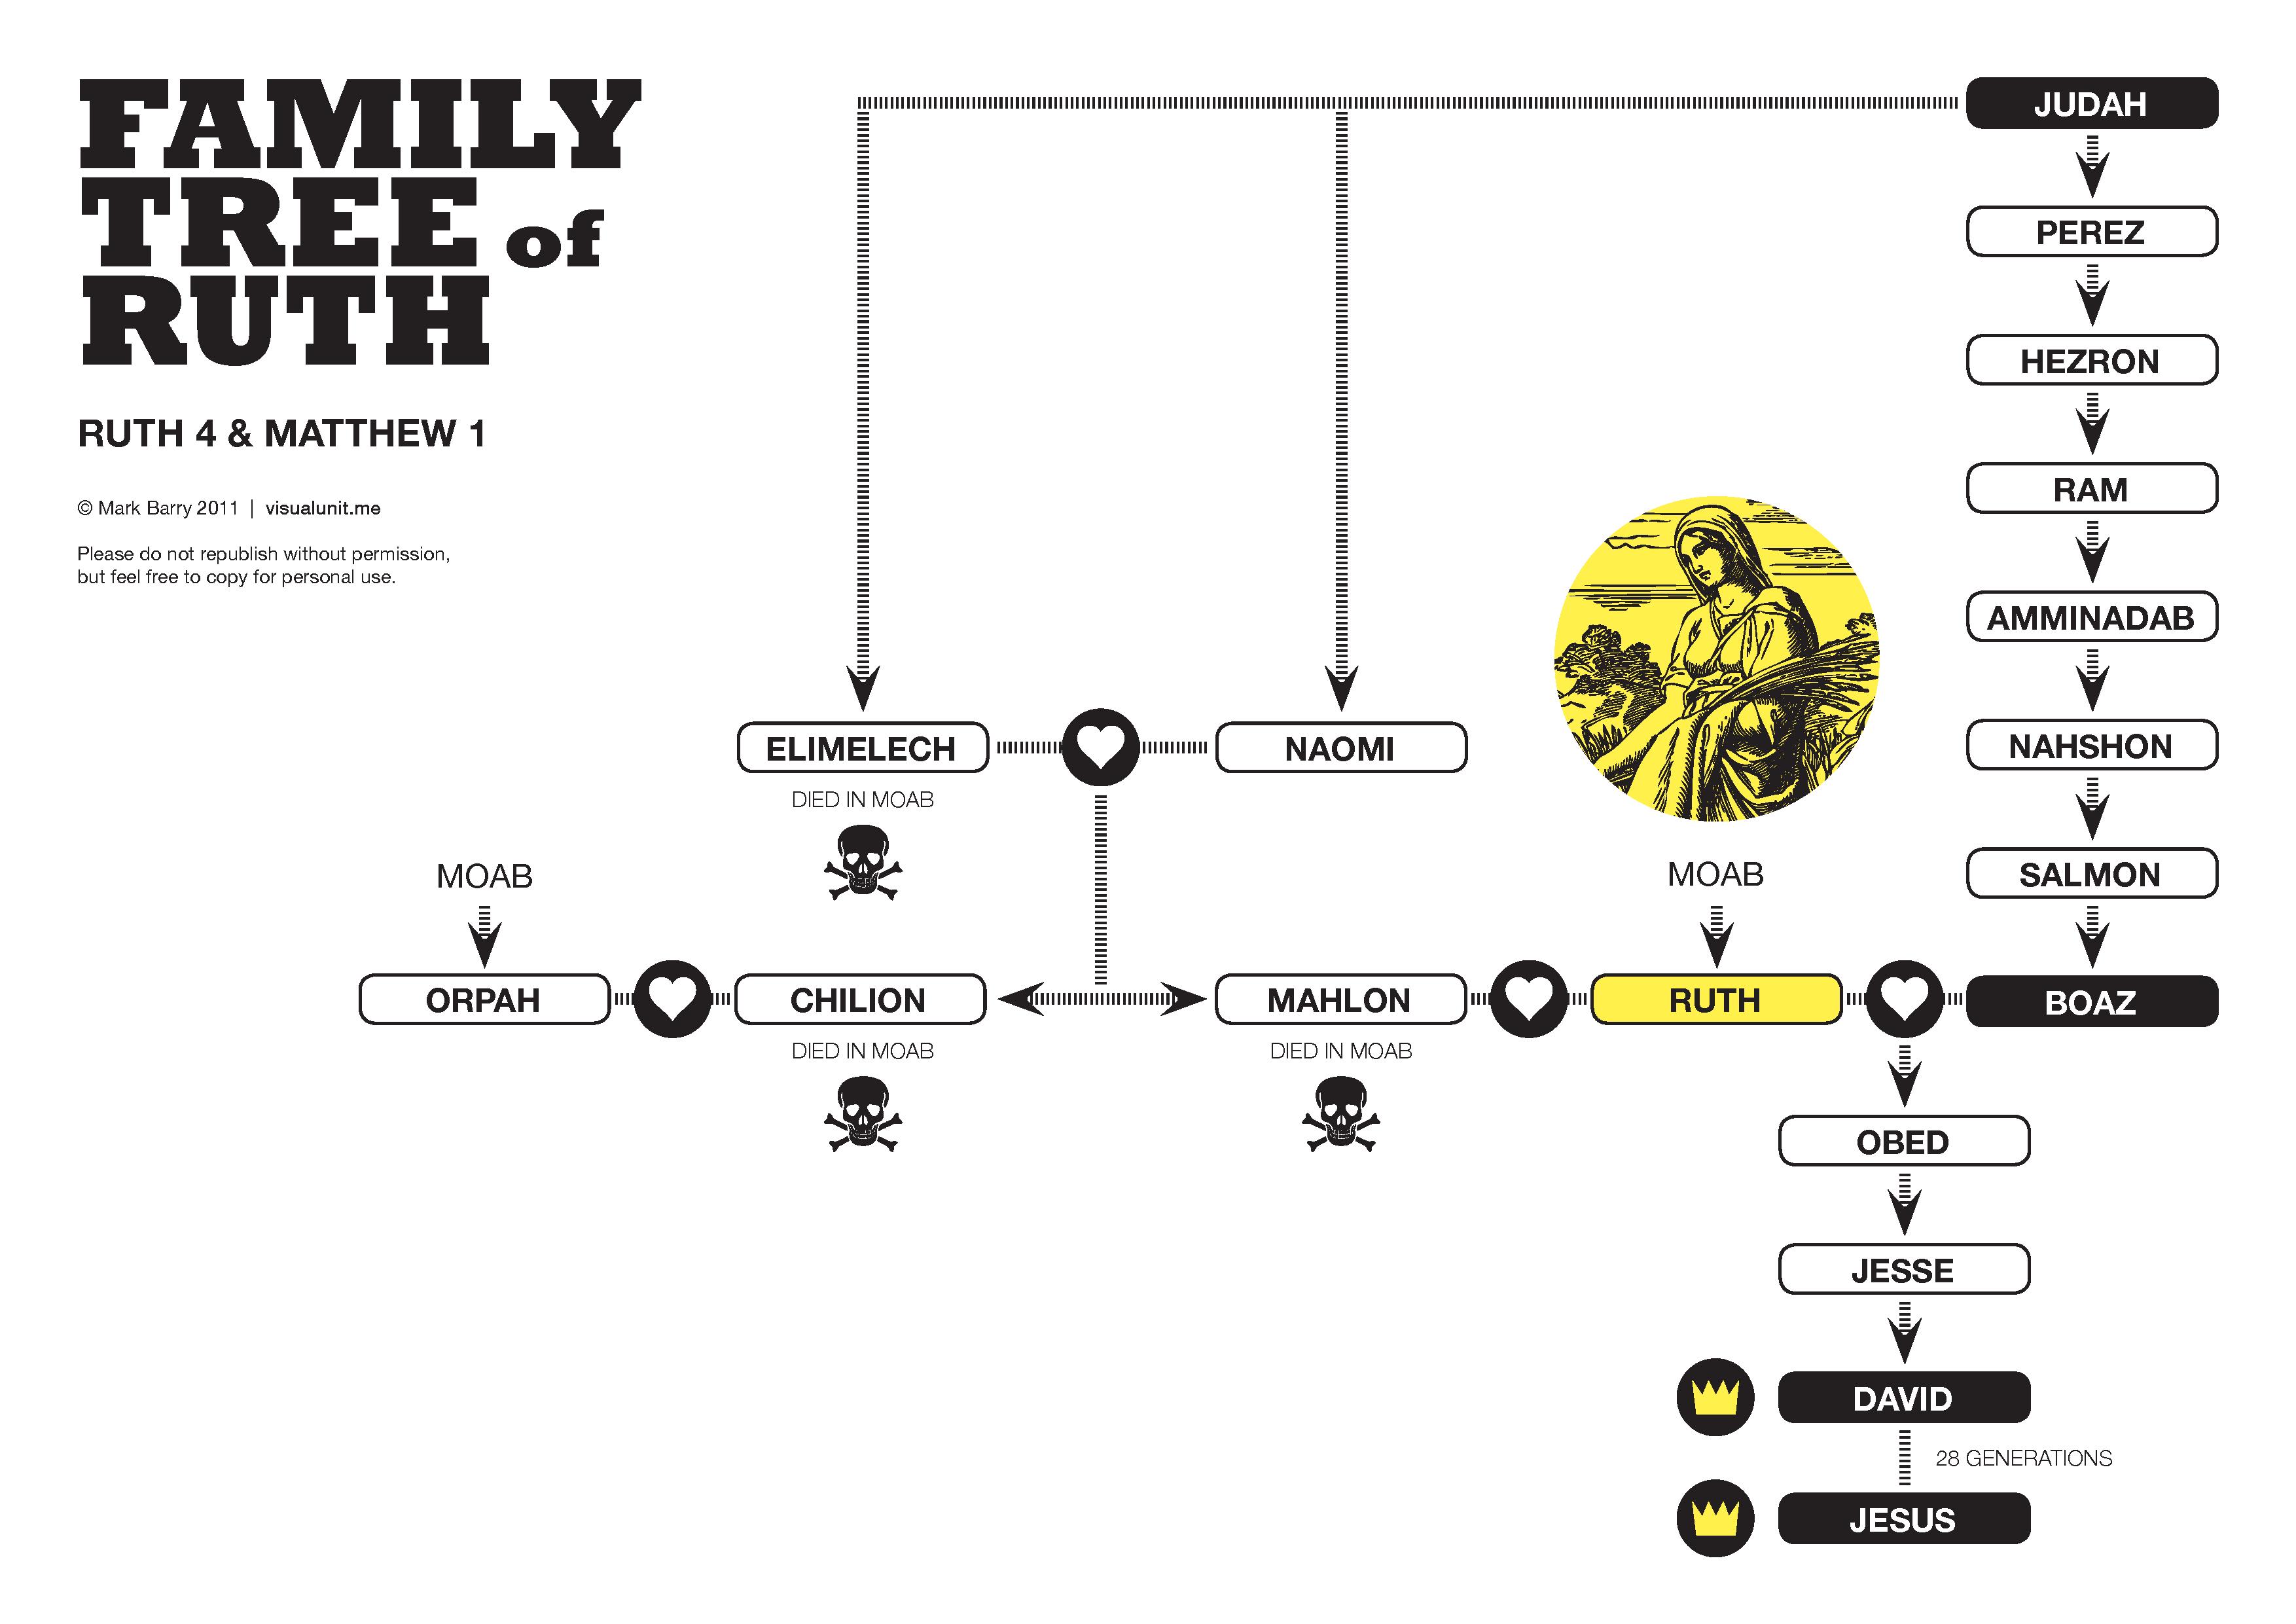 Welcome to Genealogy.com